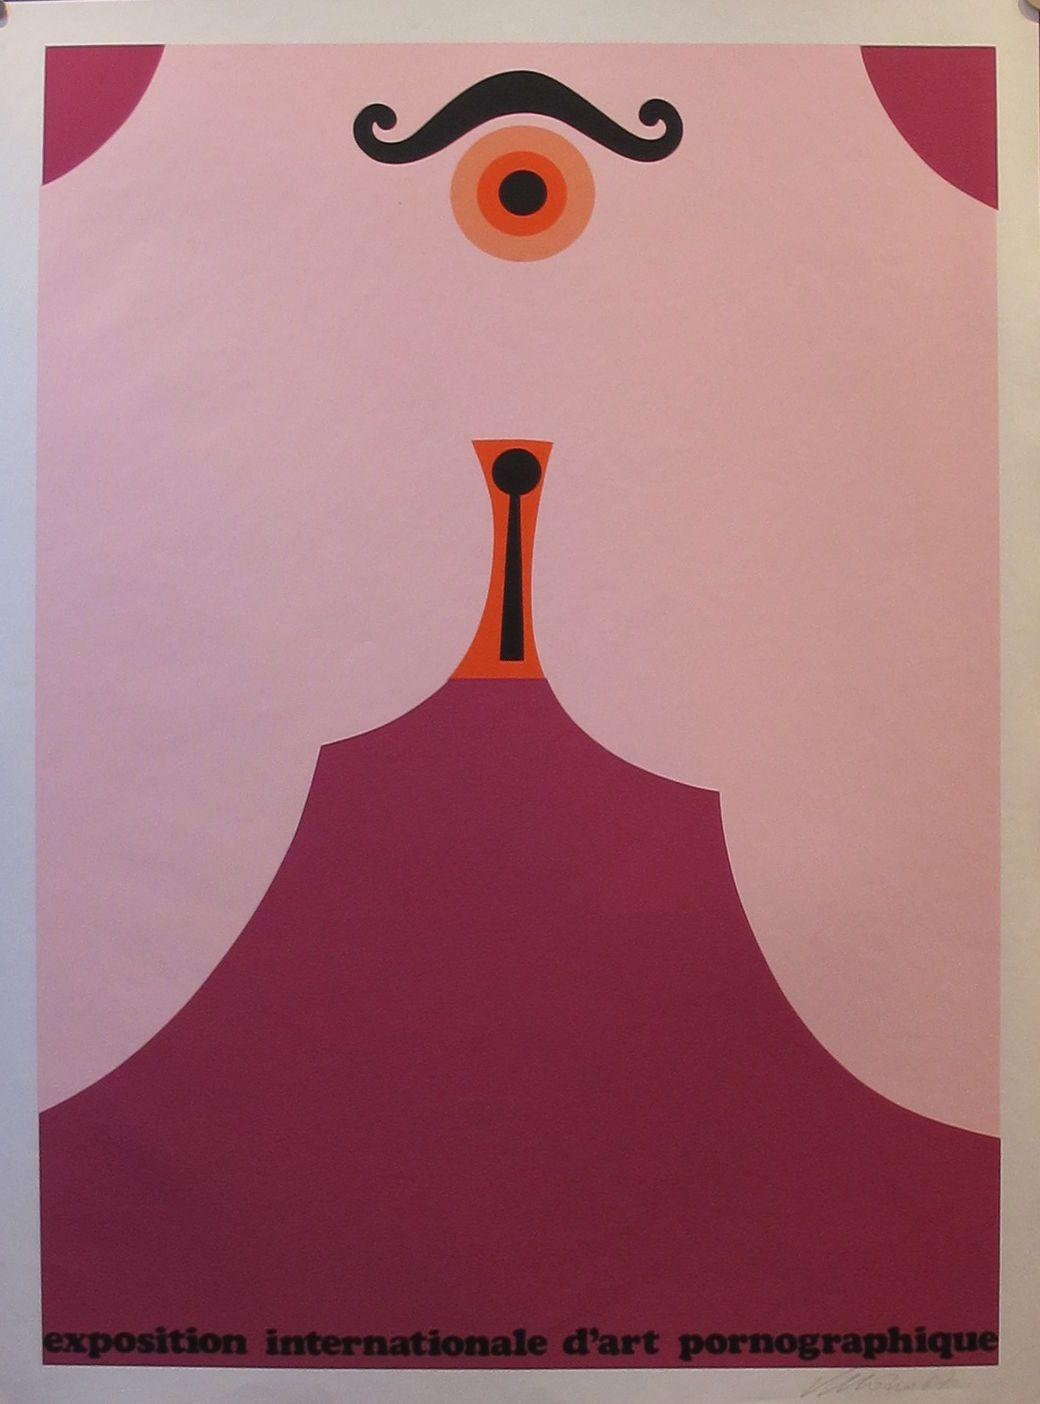 Zara poster design - Fiorucci Was Born On 2 November 1932 In Zara Italy During World War